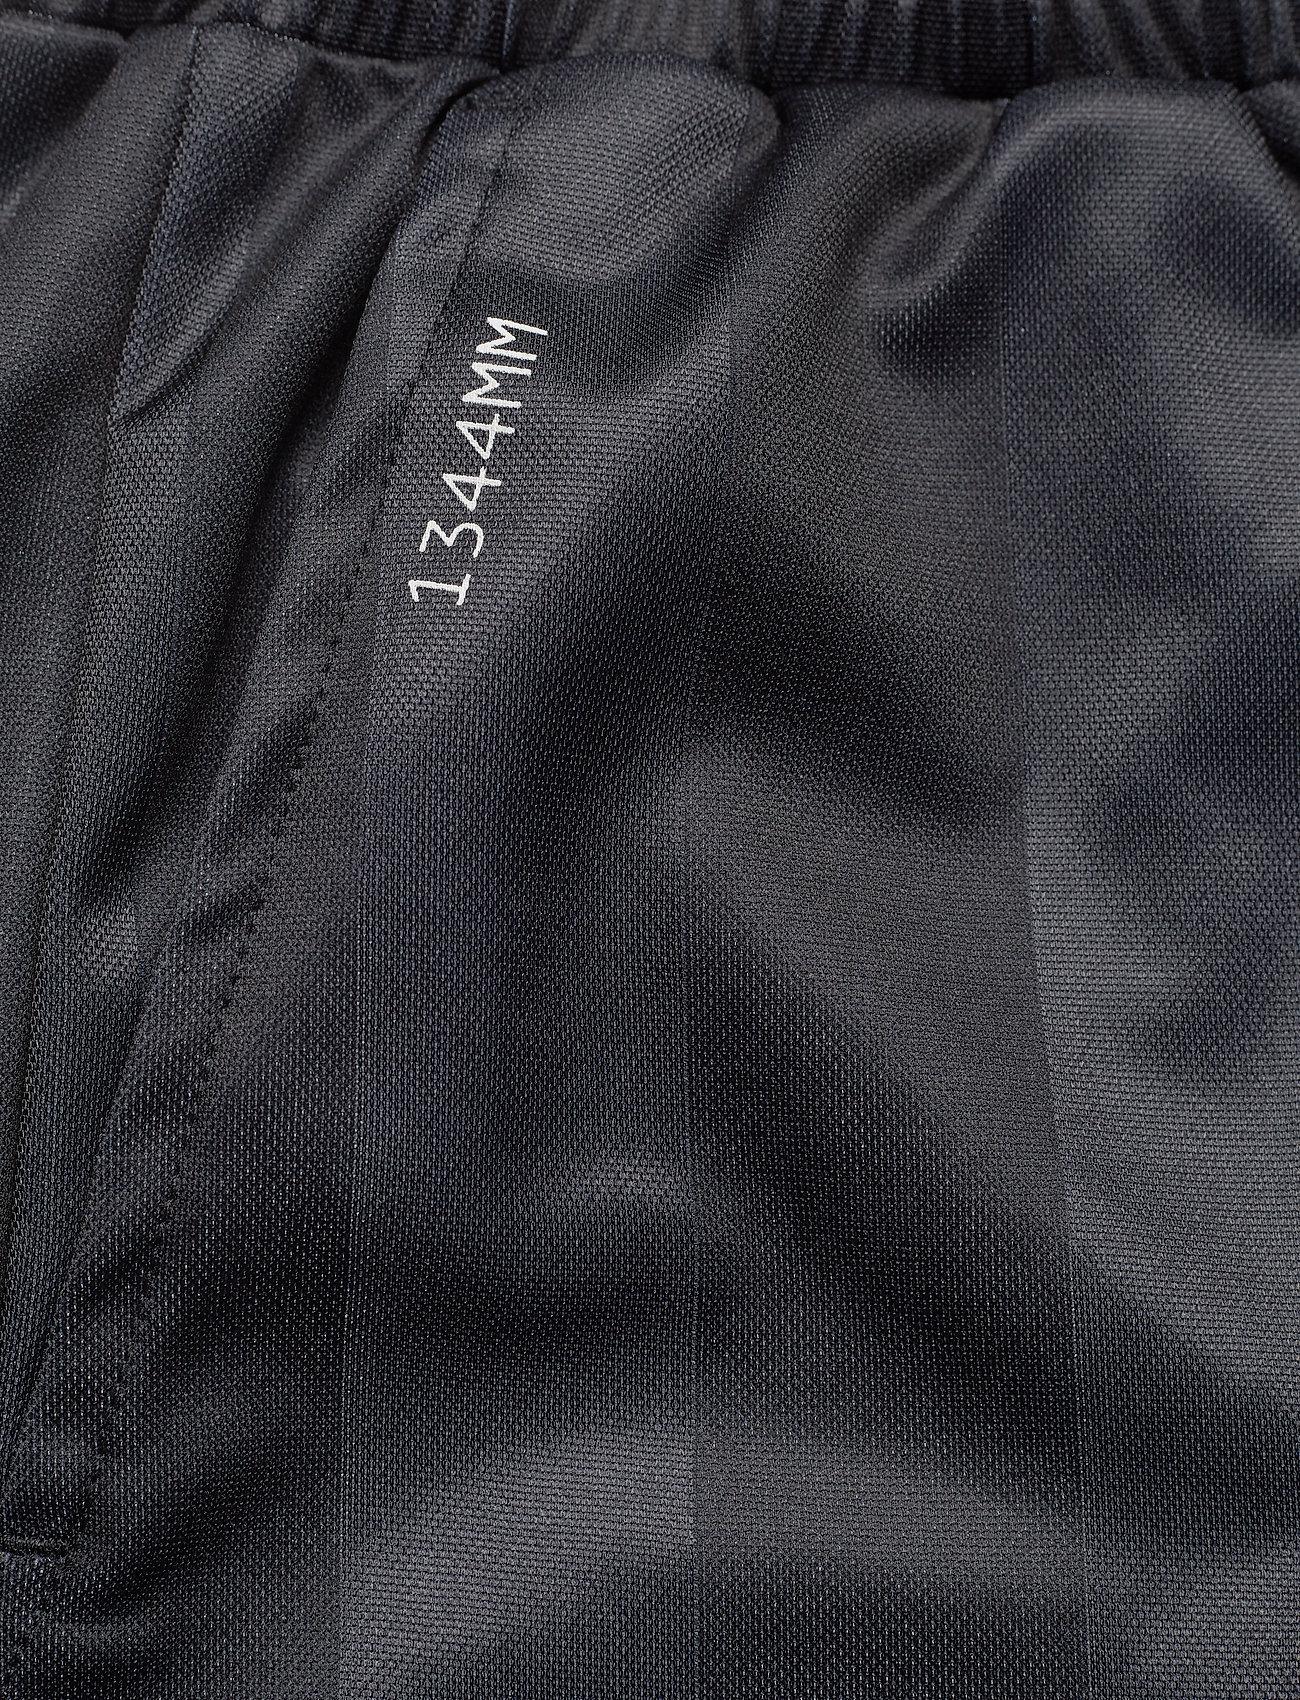 Han Kjøbenhavn Football Shorts - Black